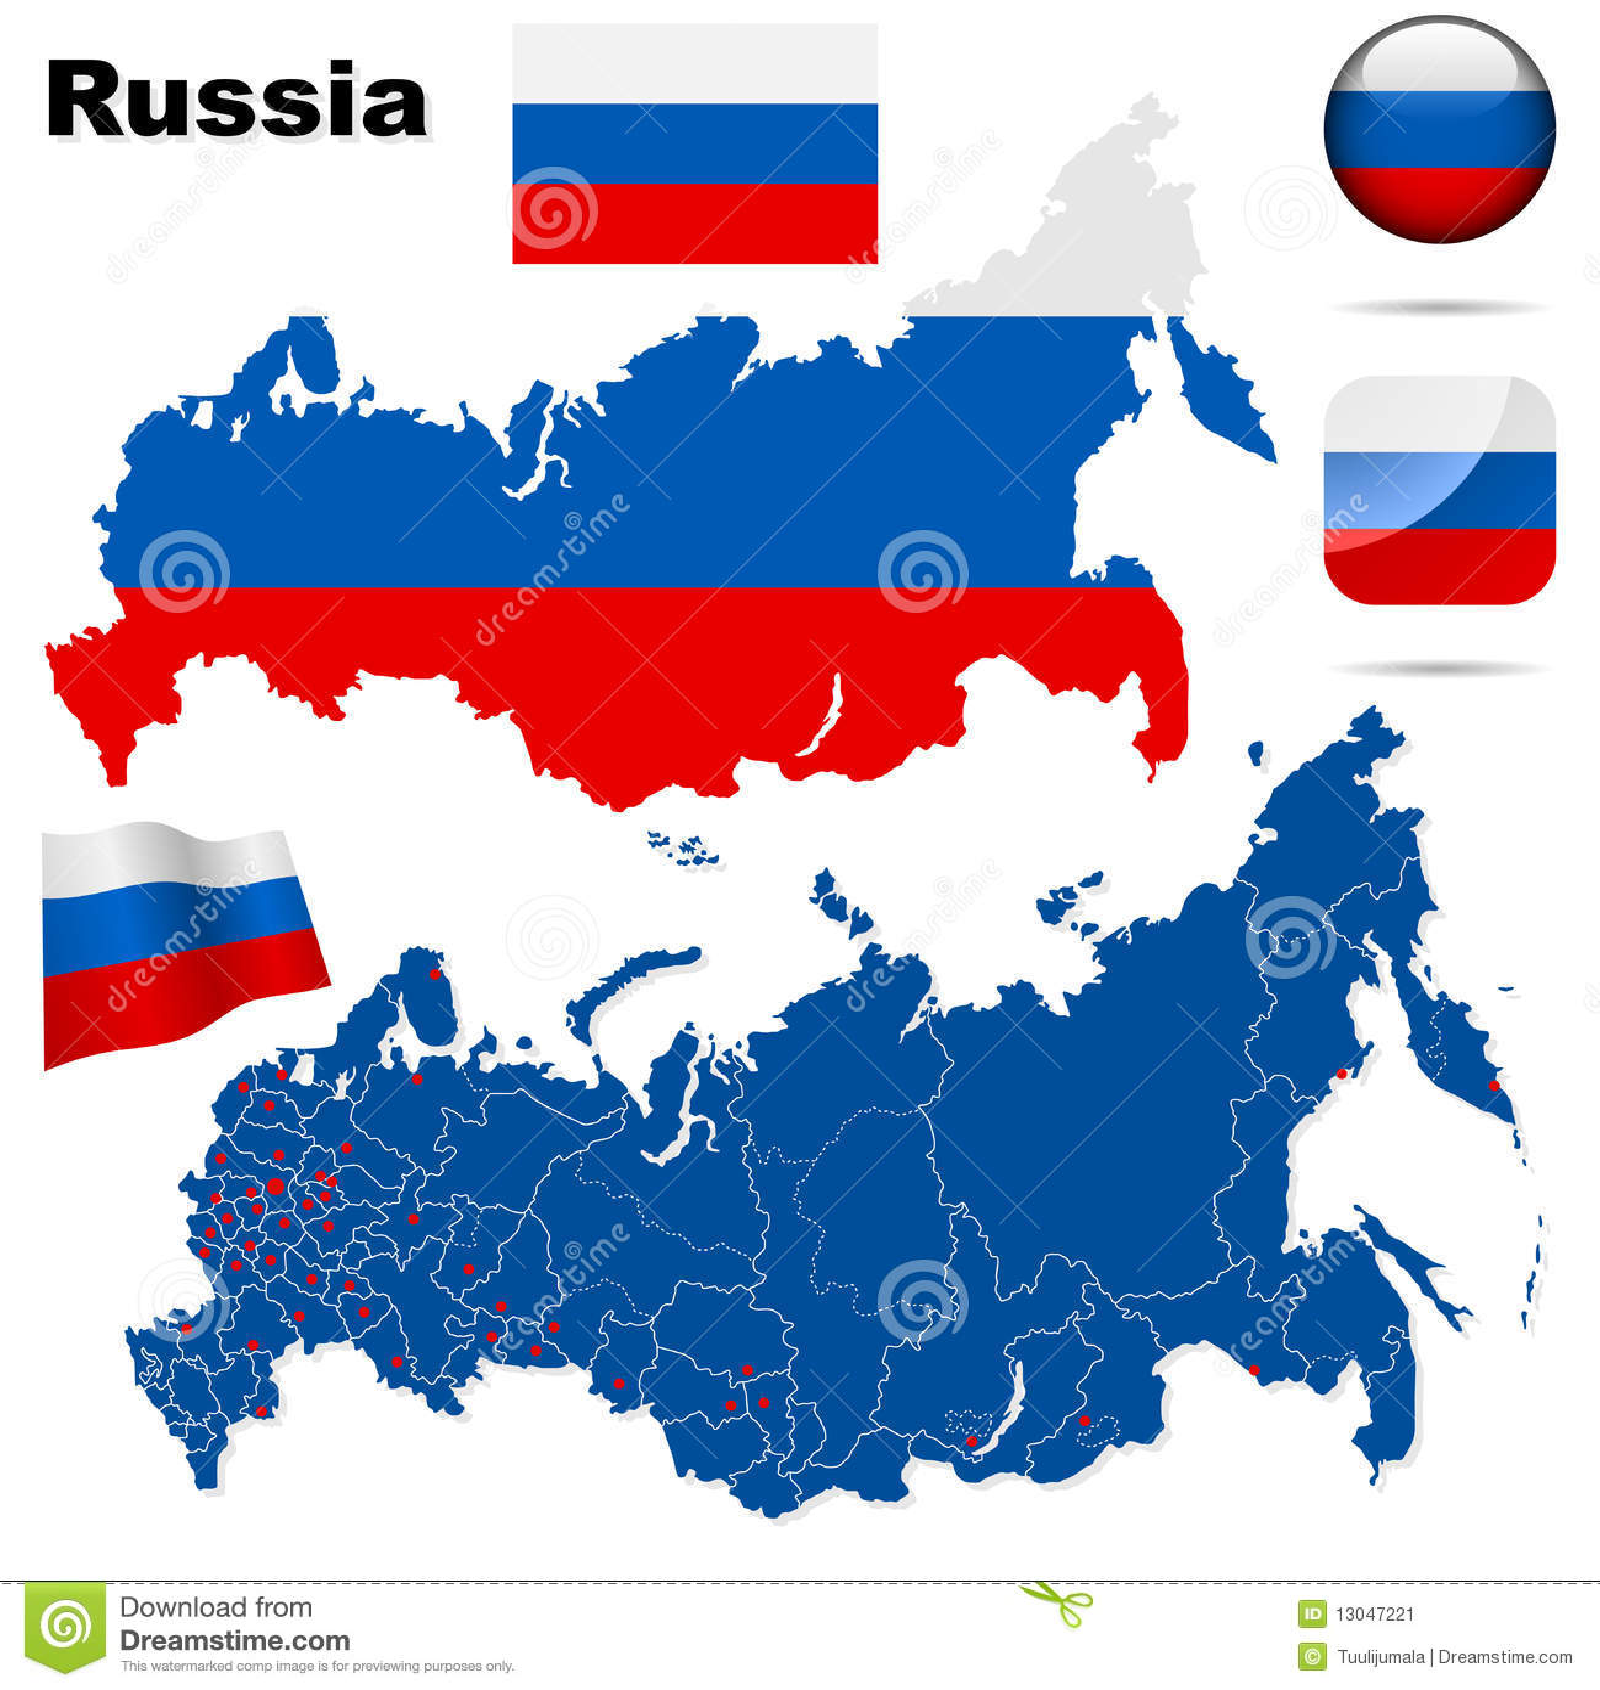 Russian Federation Understand 94